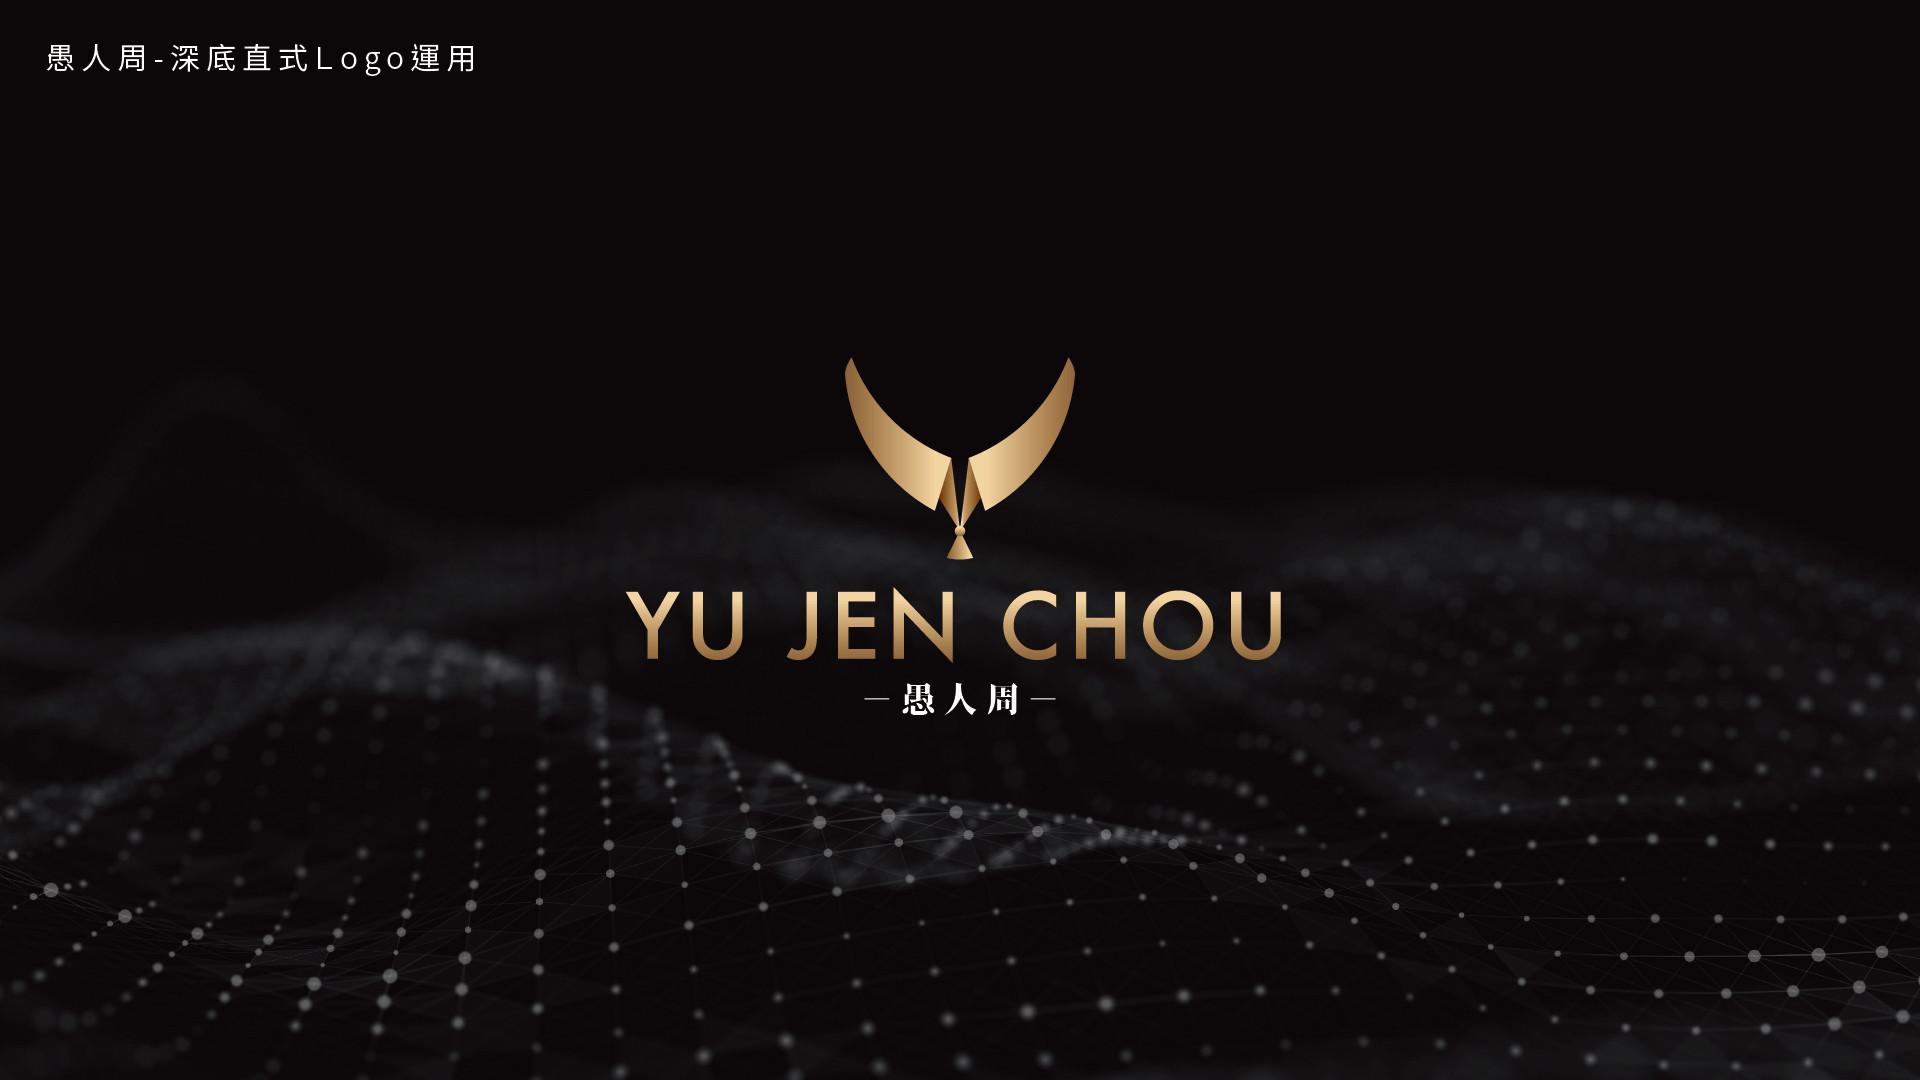 愚人周-Logo-2整-06.jpg